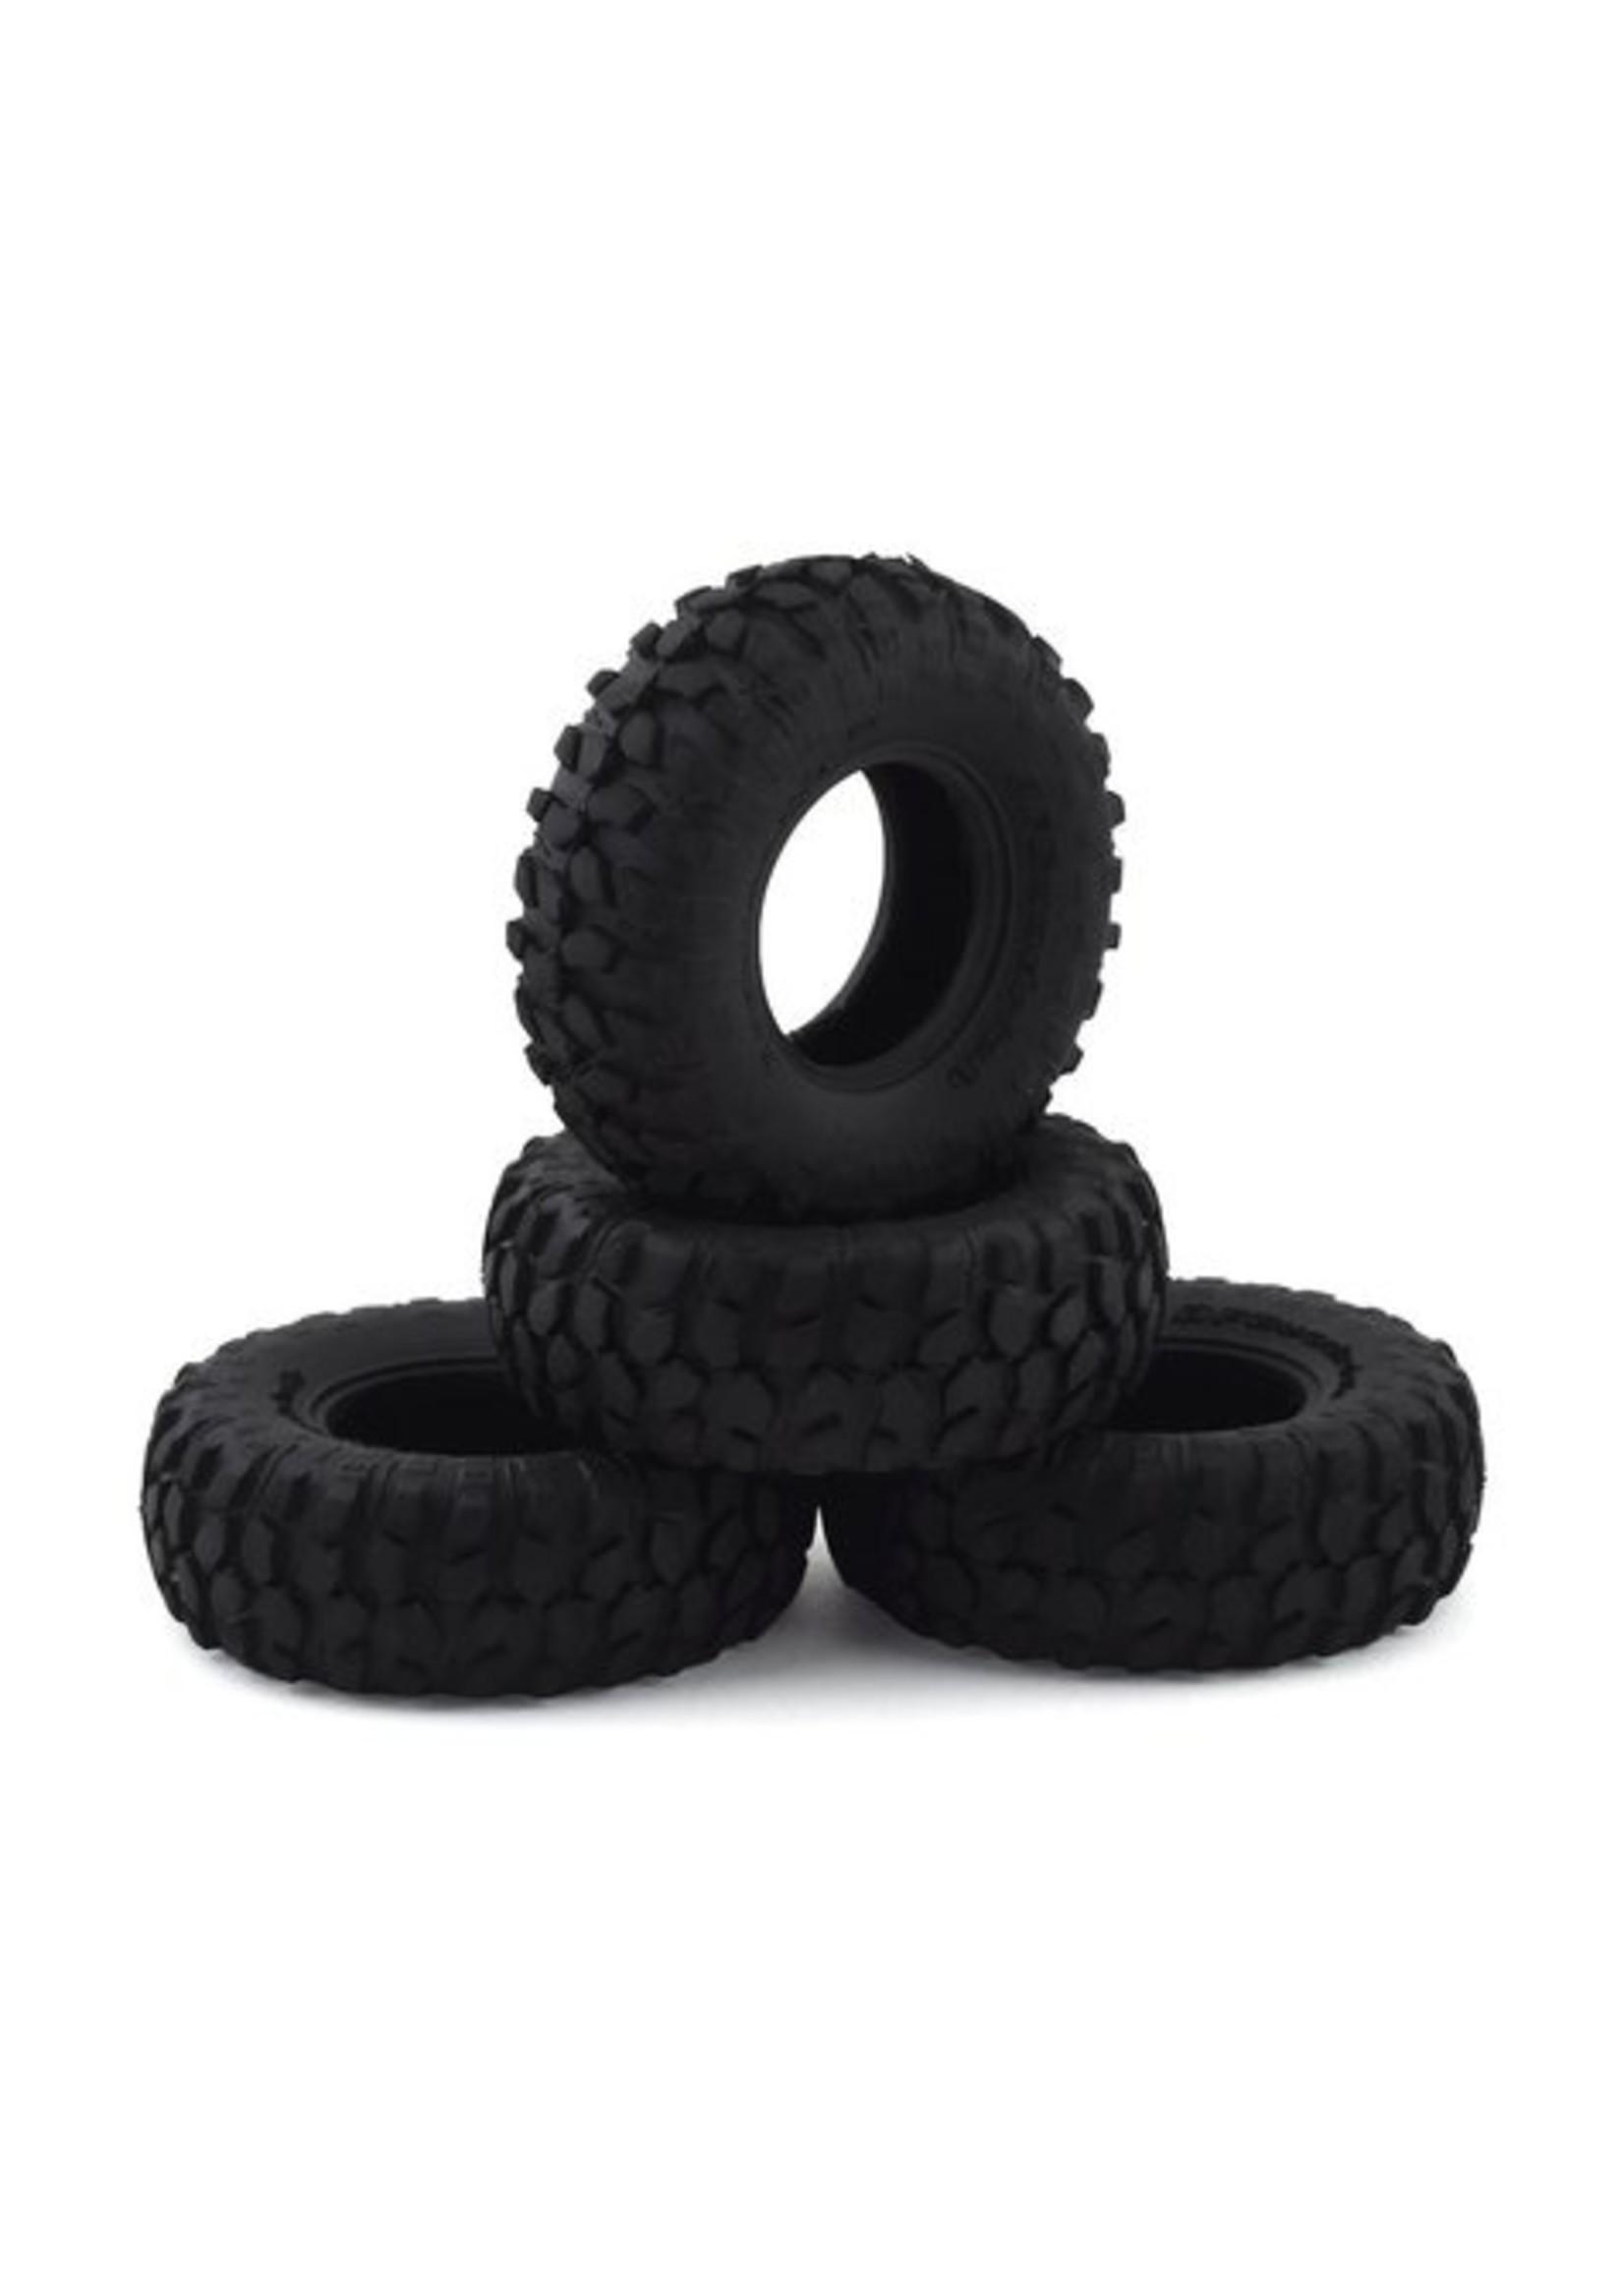 Axial AXI40001 Axial 1.0 BFGoodrich Krawler T/A Tires (4pcs): SCX24